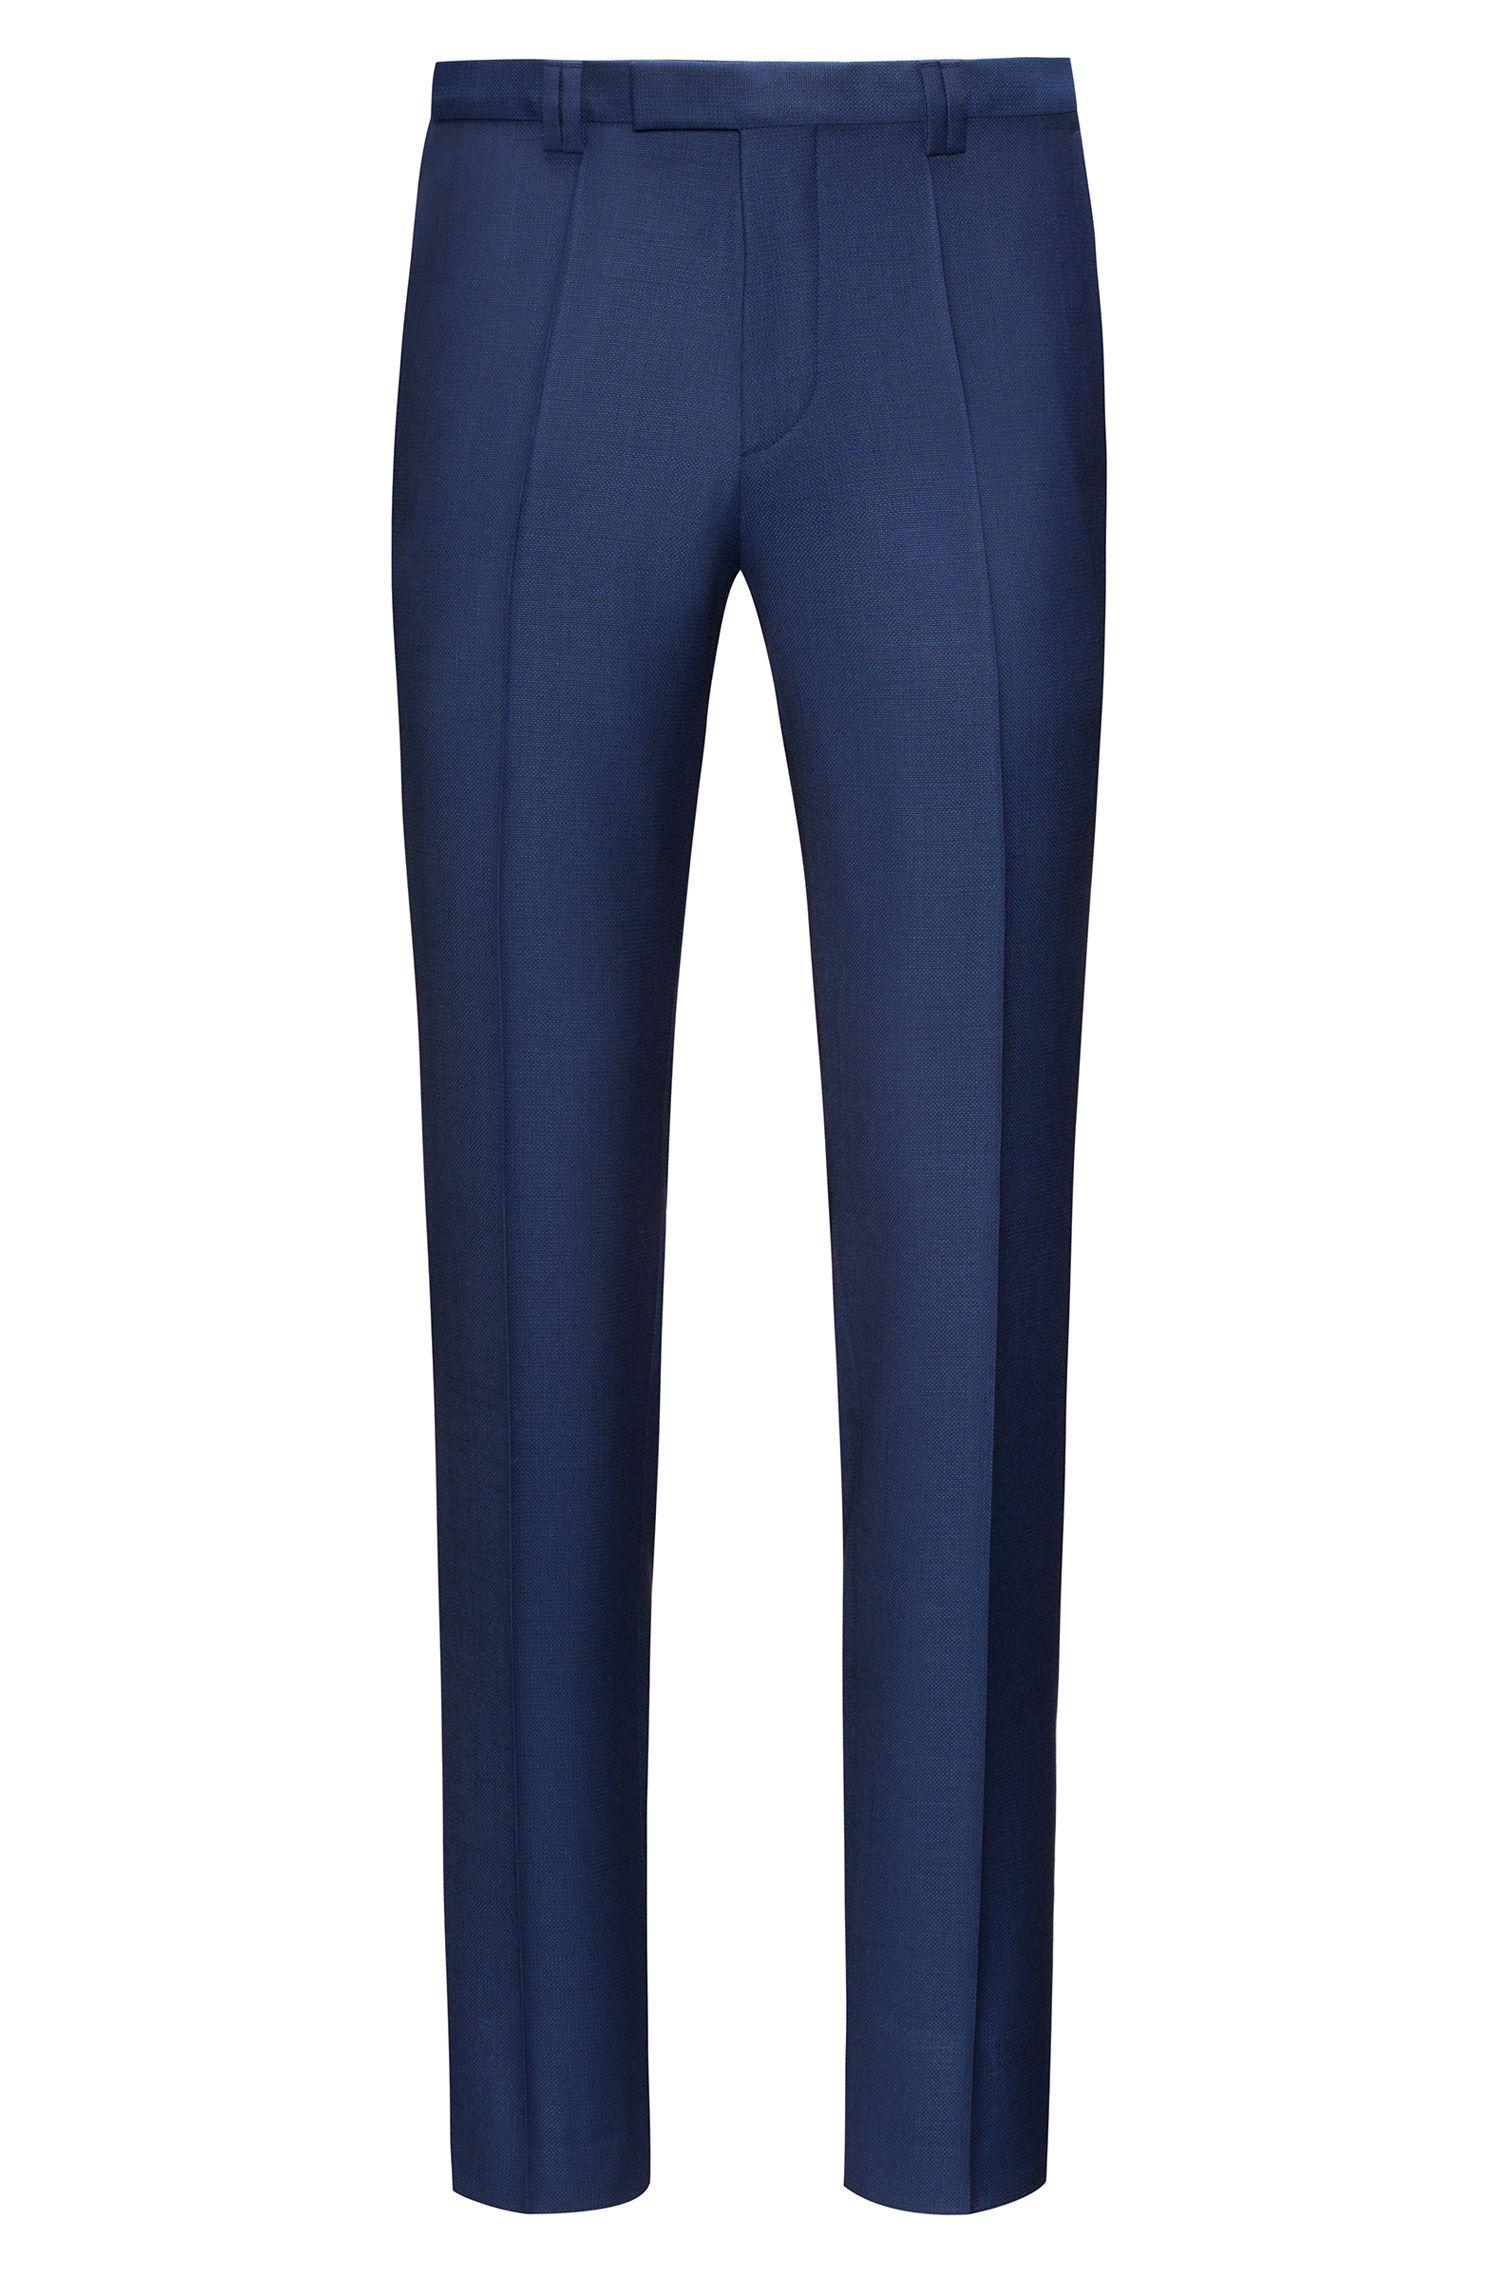 Pantaloni extra slim fit in lana effetto nattè